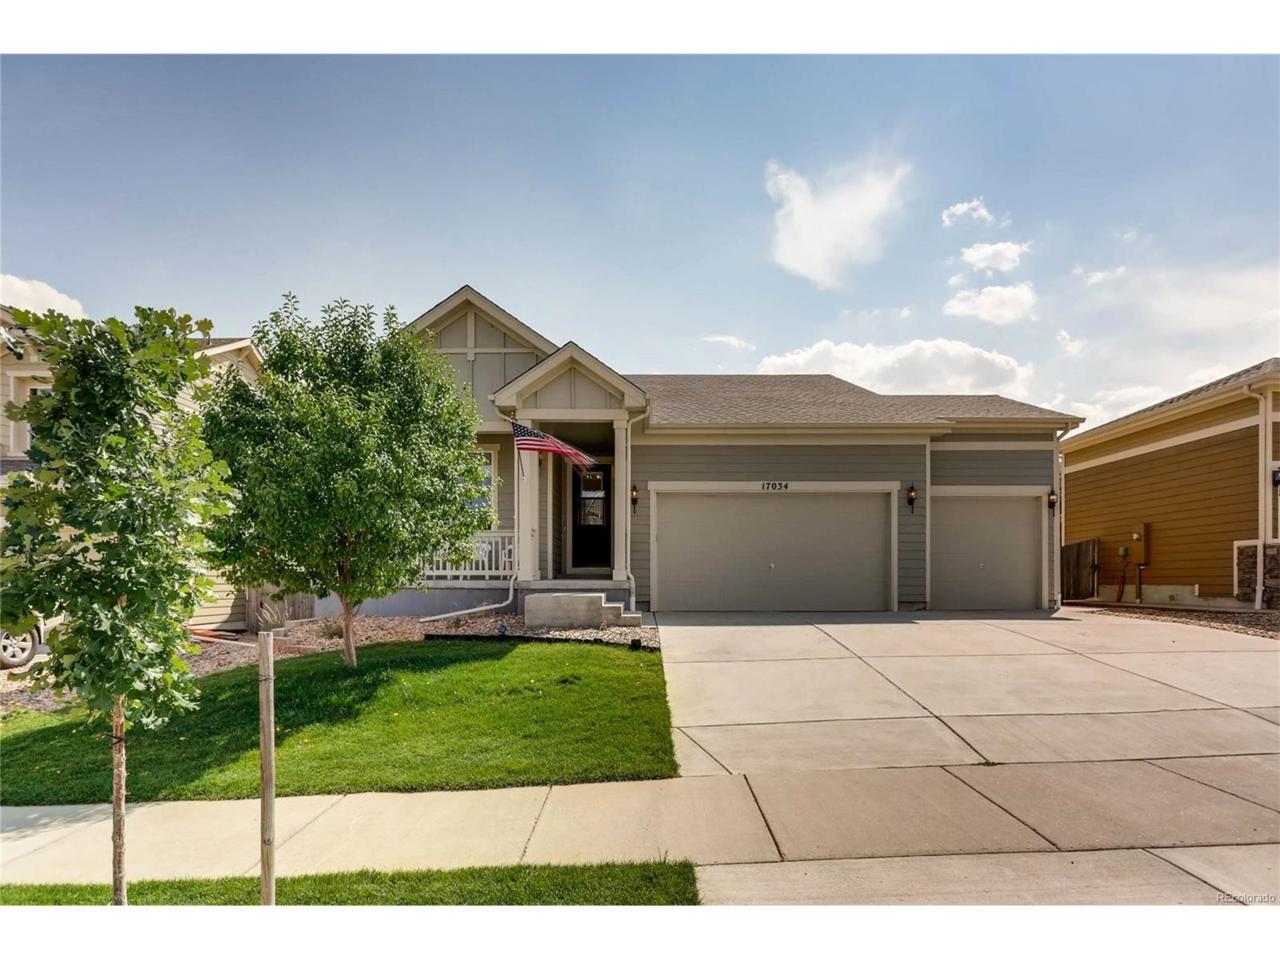 17034 White Alba Lane, Parker, CO 80134 (MLS #4280093) :: 8z Real Estate